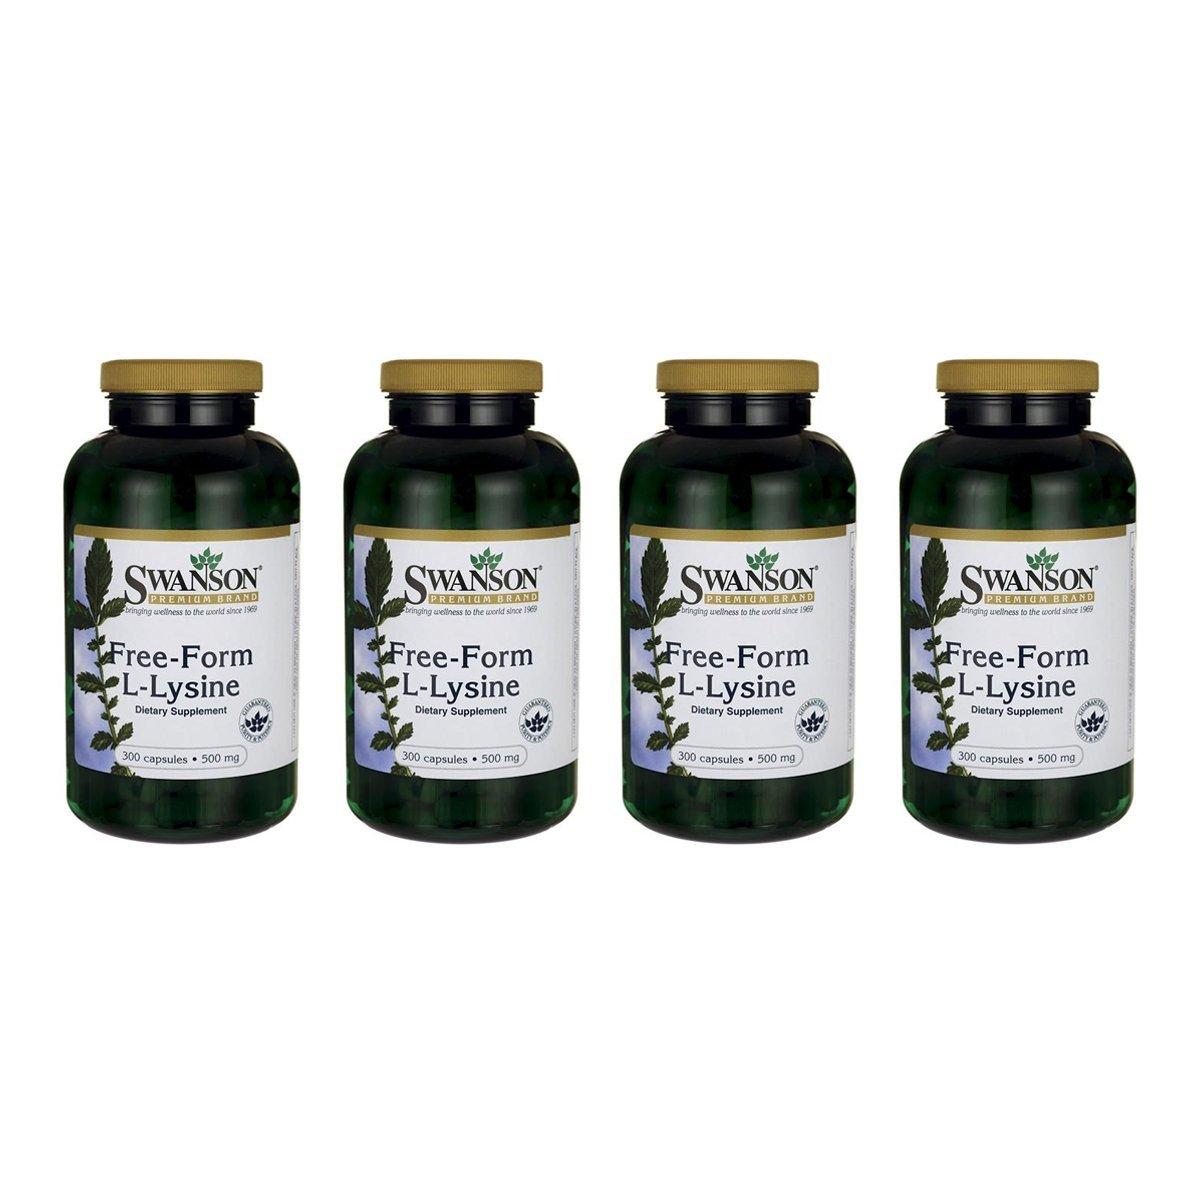 Swanson Free-Form L-Lysine 500 mg 300 Caps 4 Pack